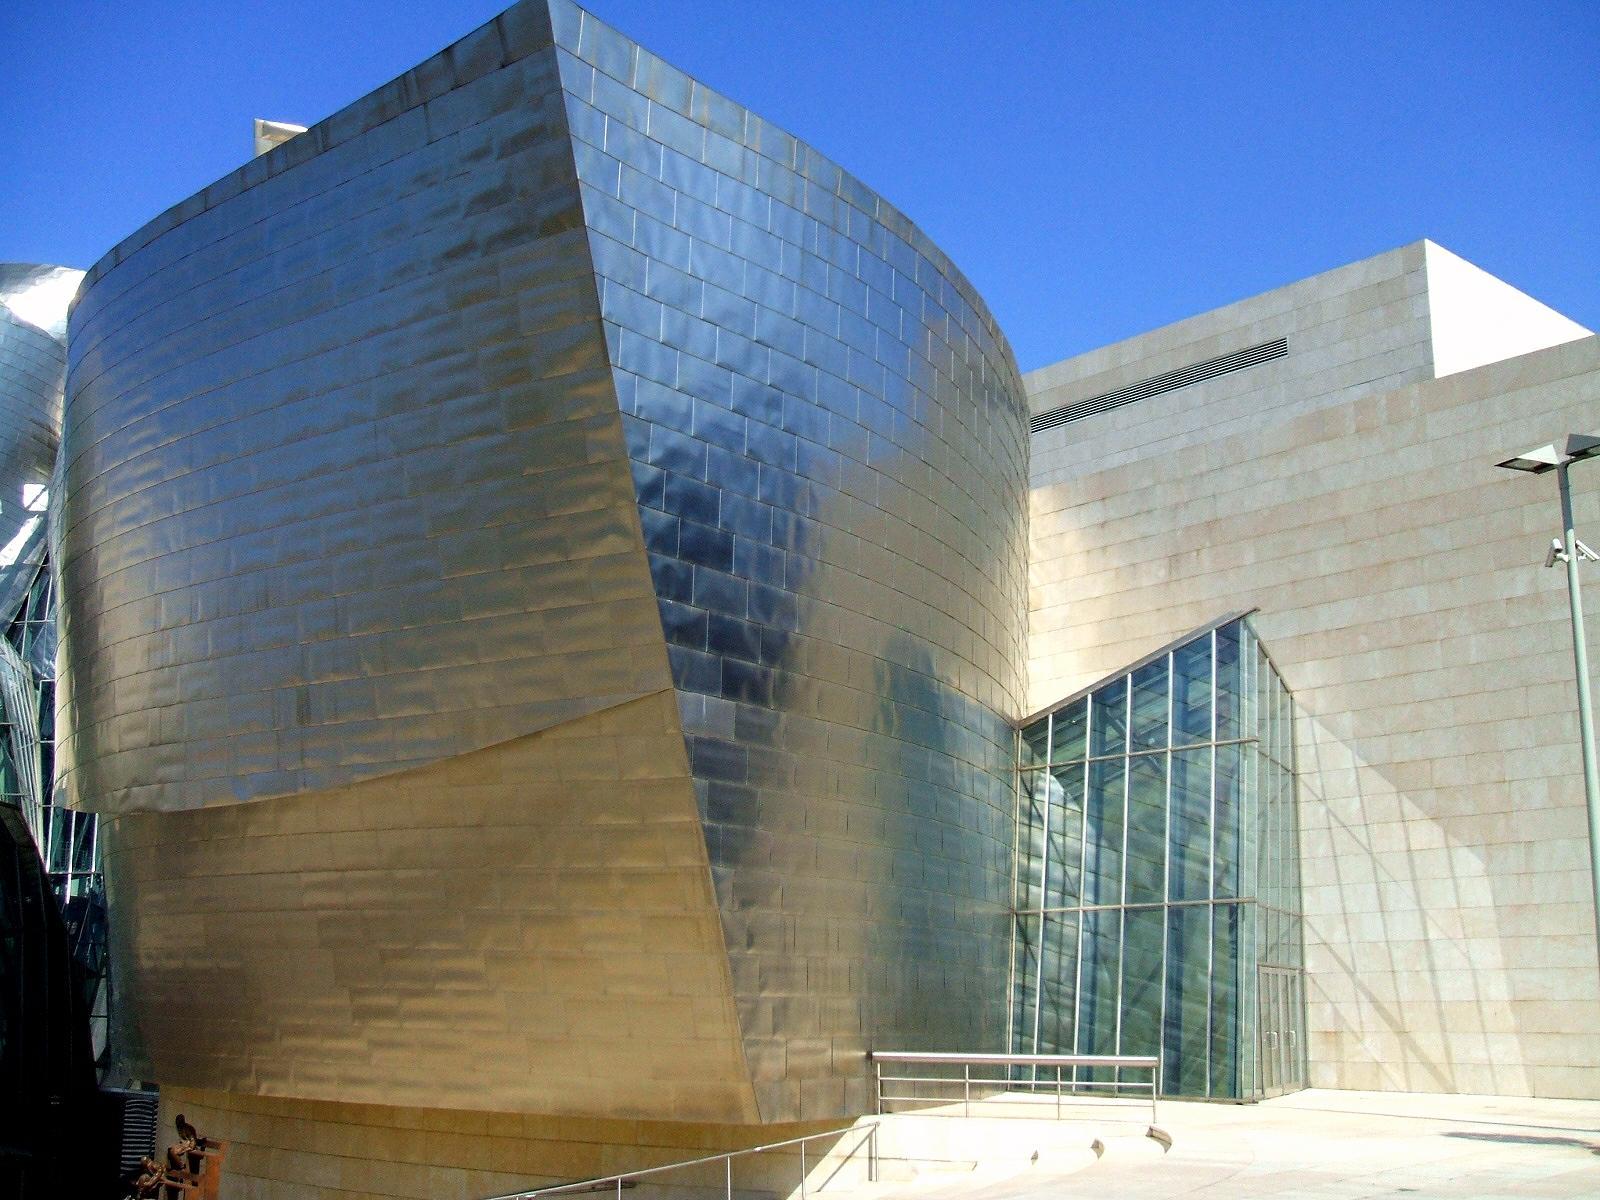 Franky Gehry's Bilbao_-_Guggenheim_06